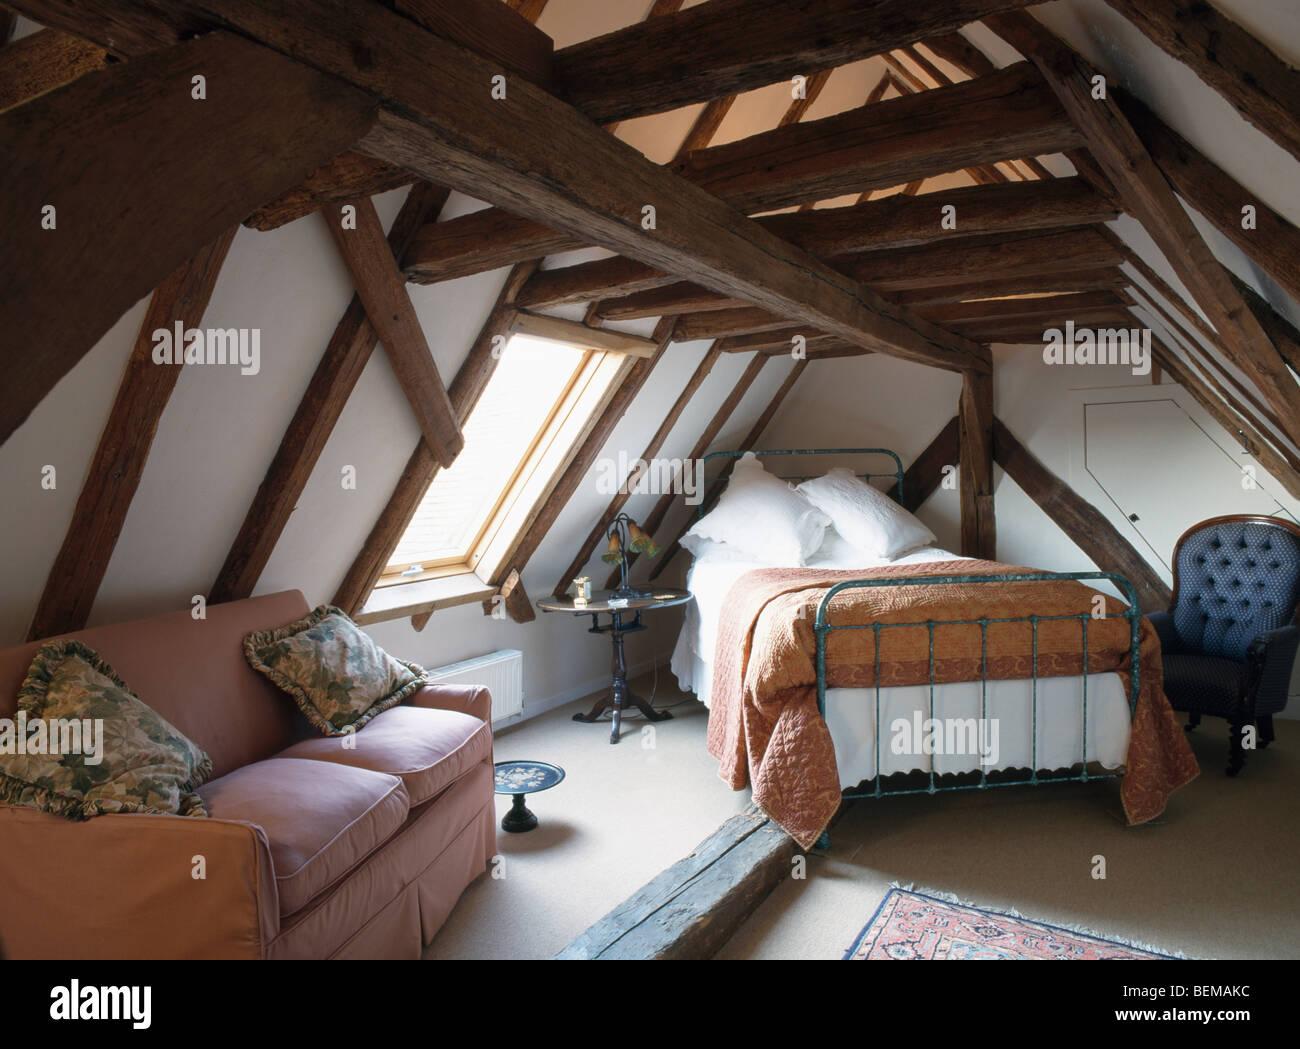 Attic Bed conversion attic pink bedroom stock photos & conversion attic pink